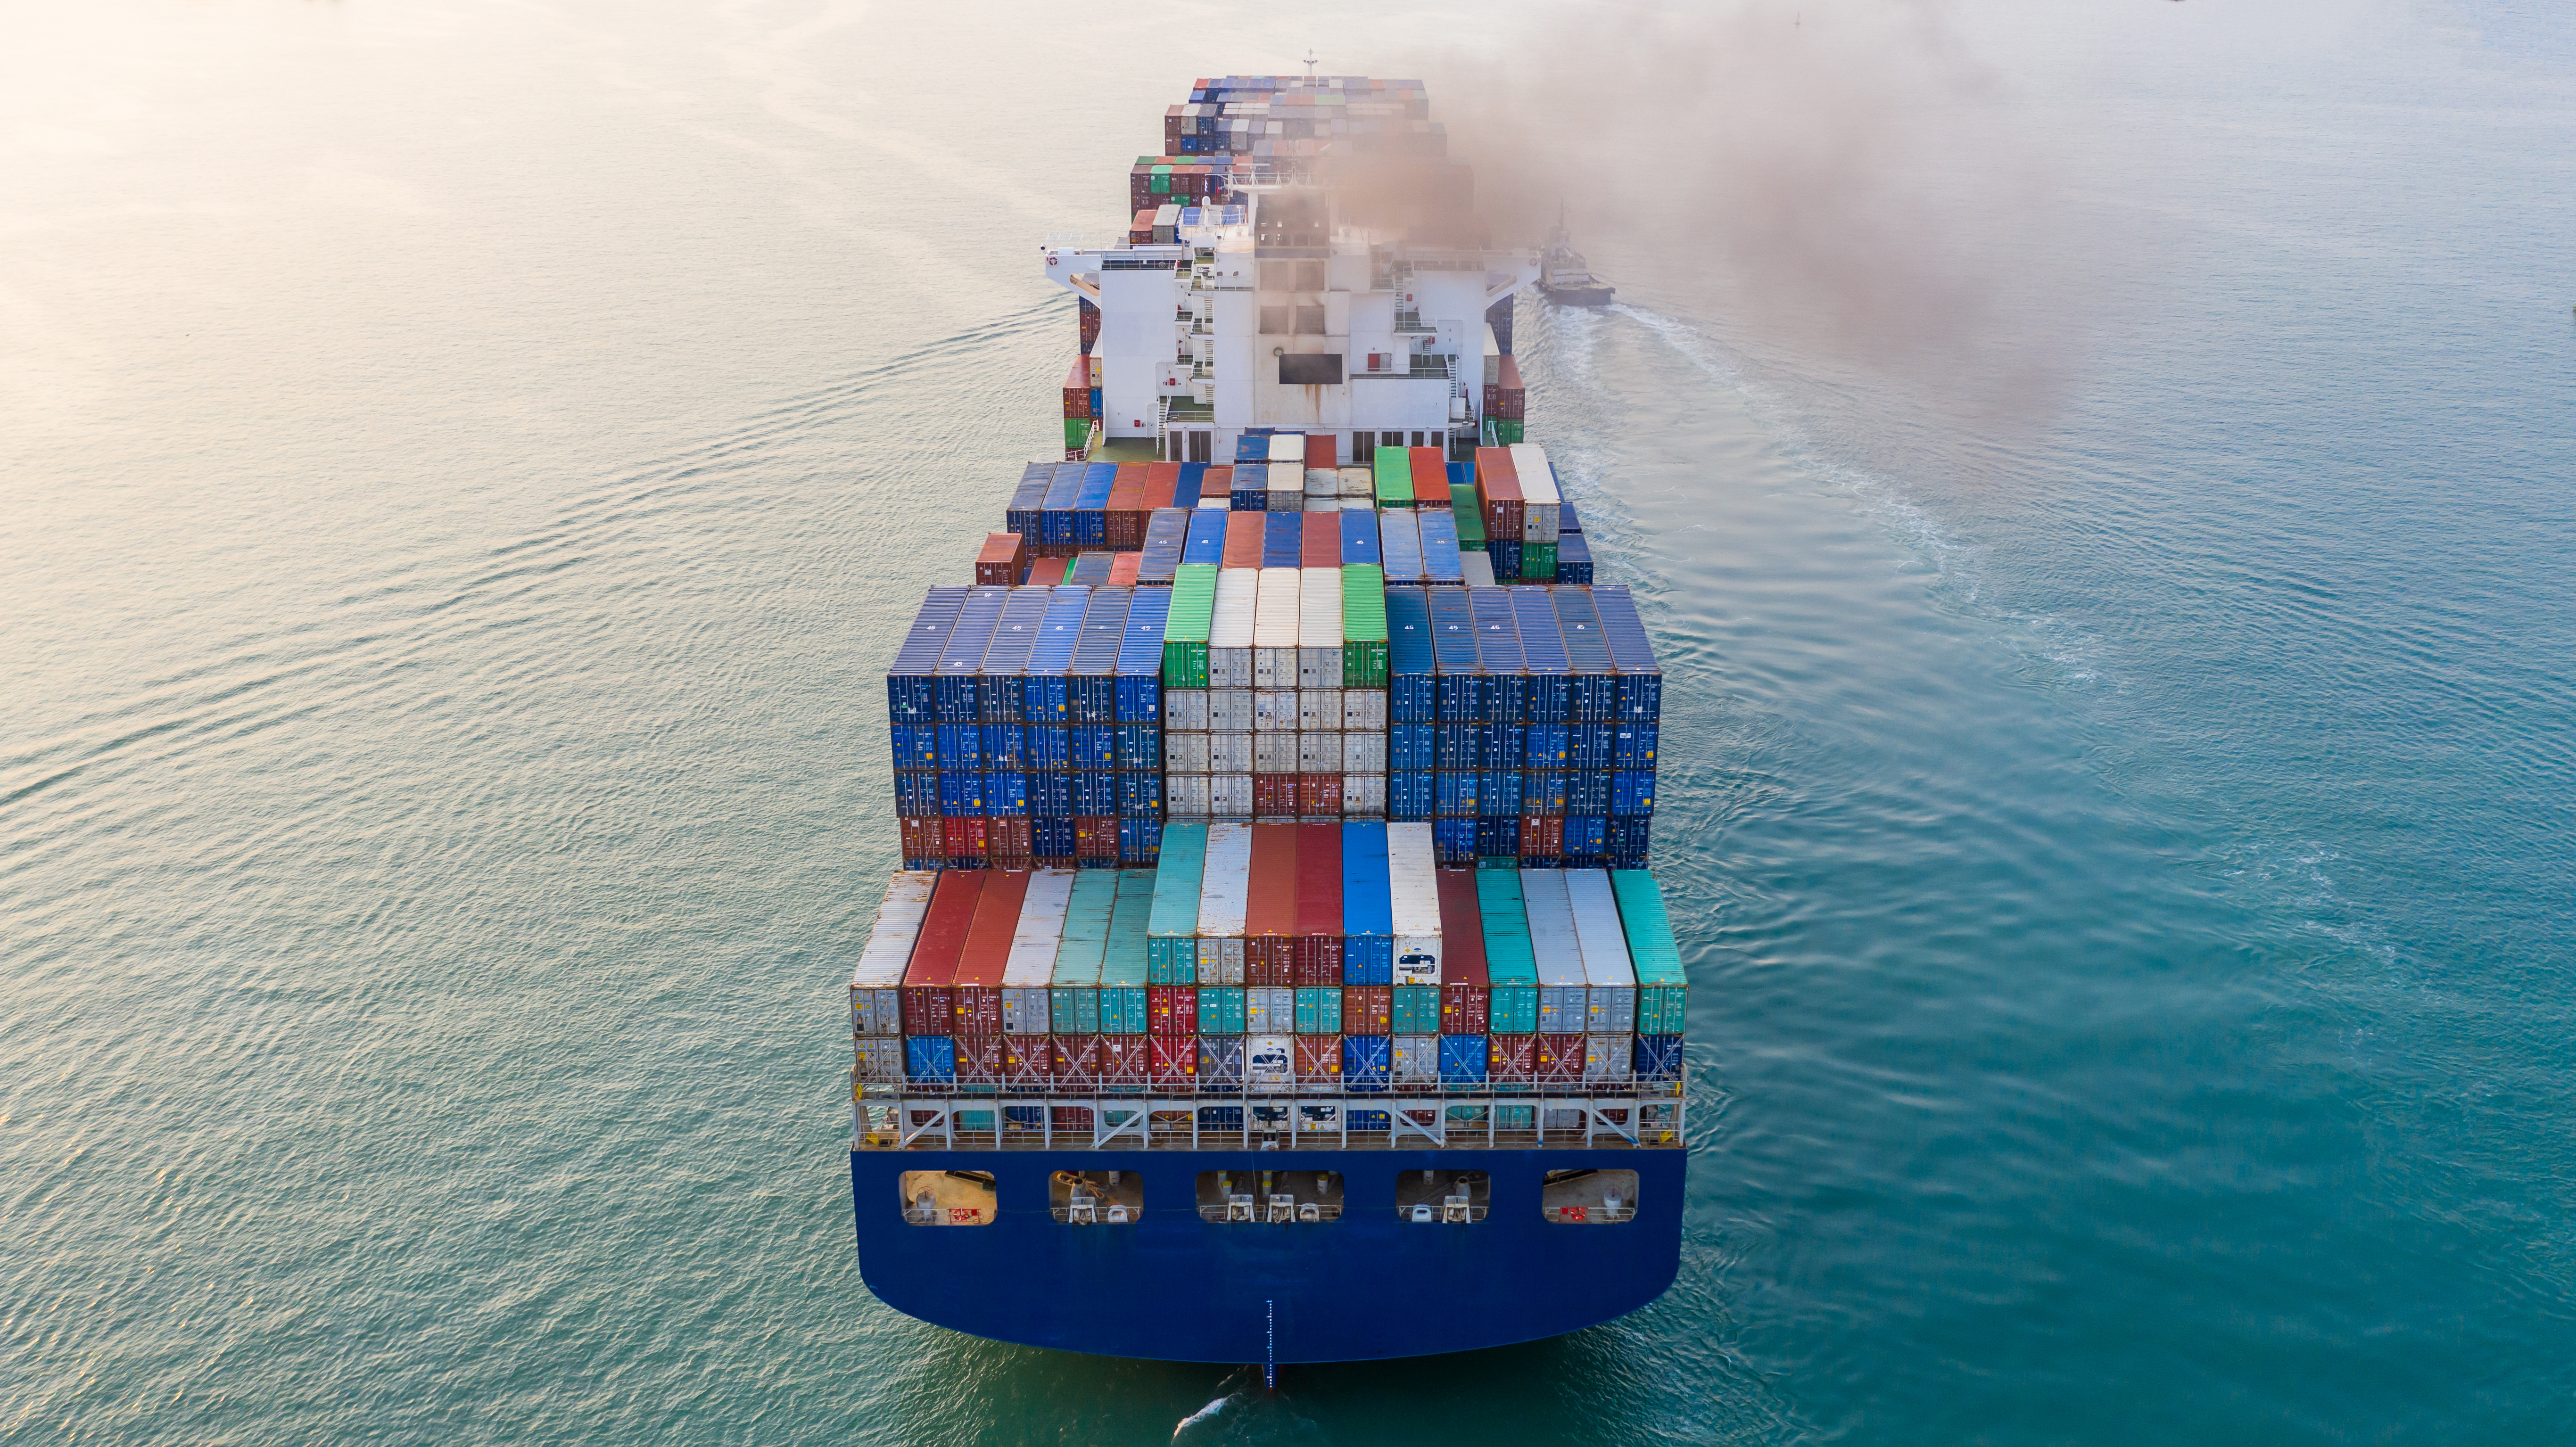 comercio mundial supera niveles